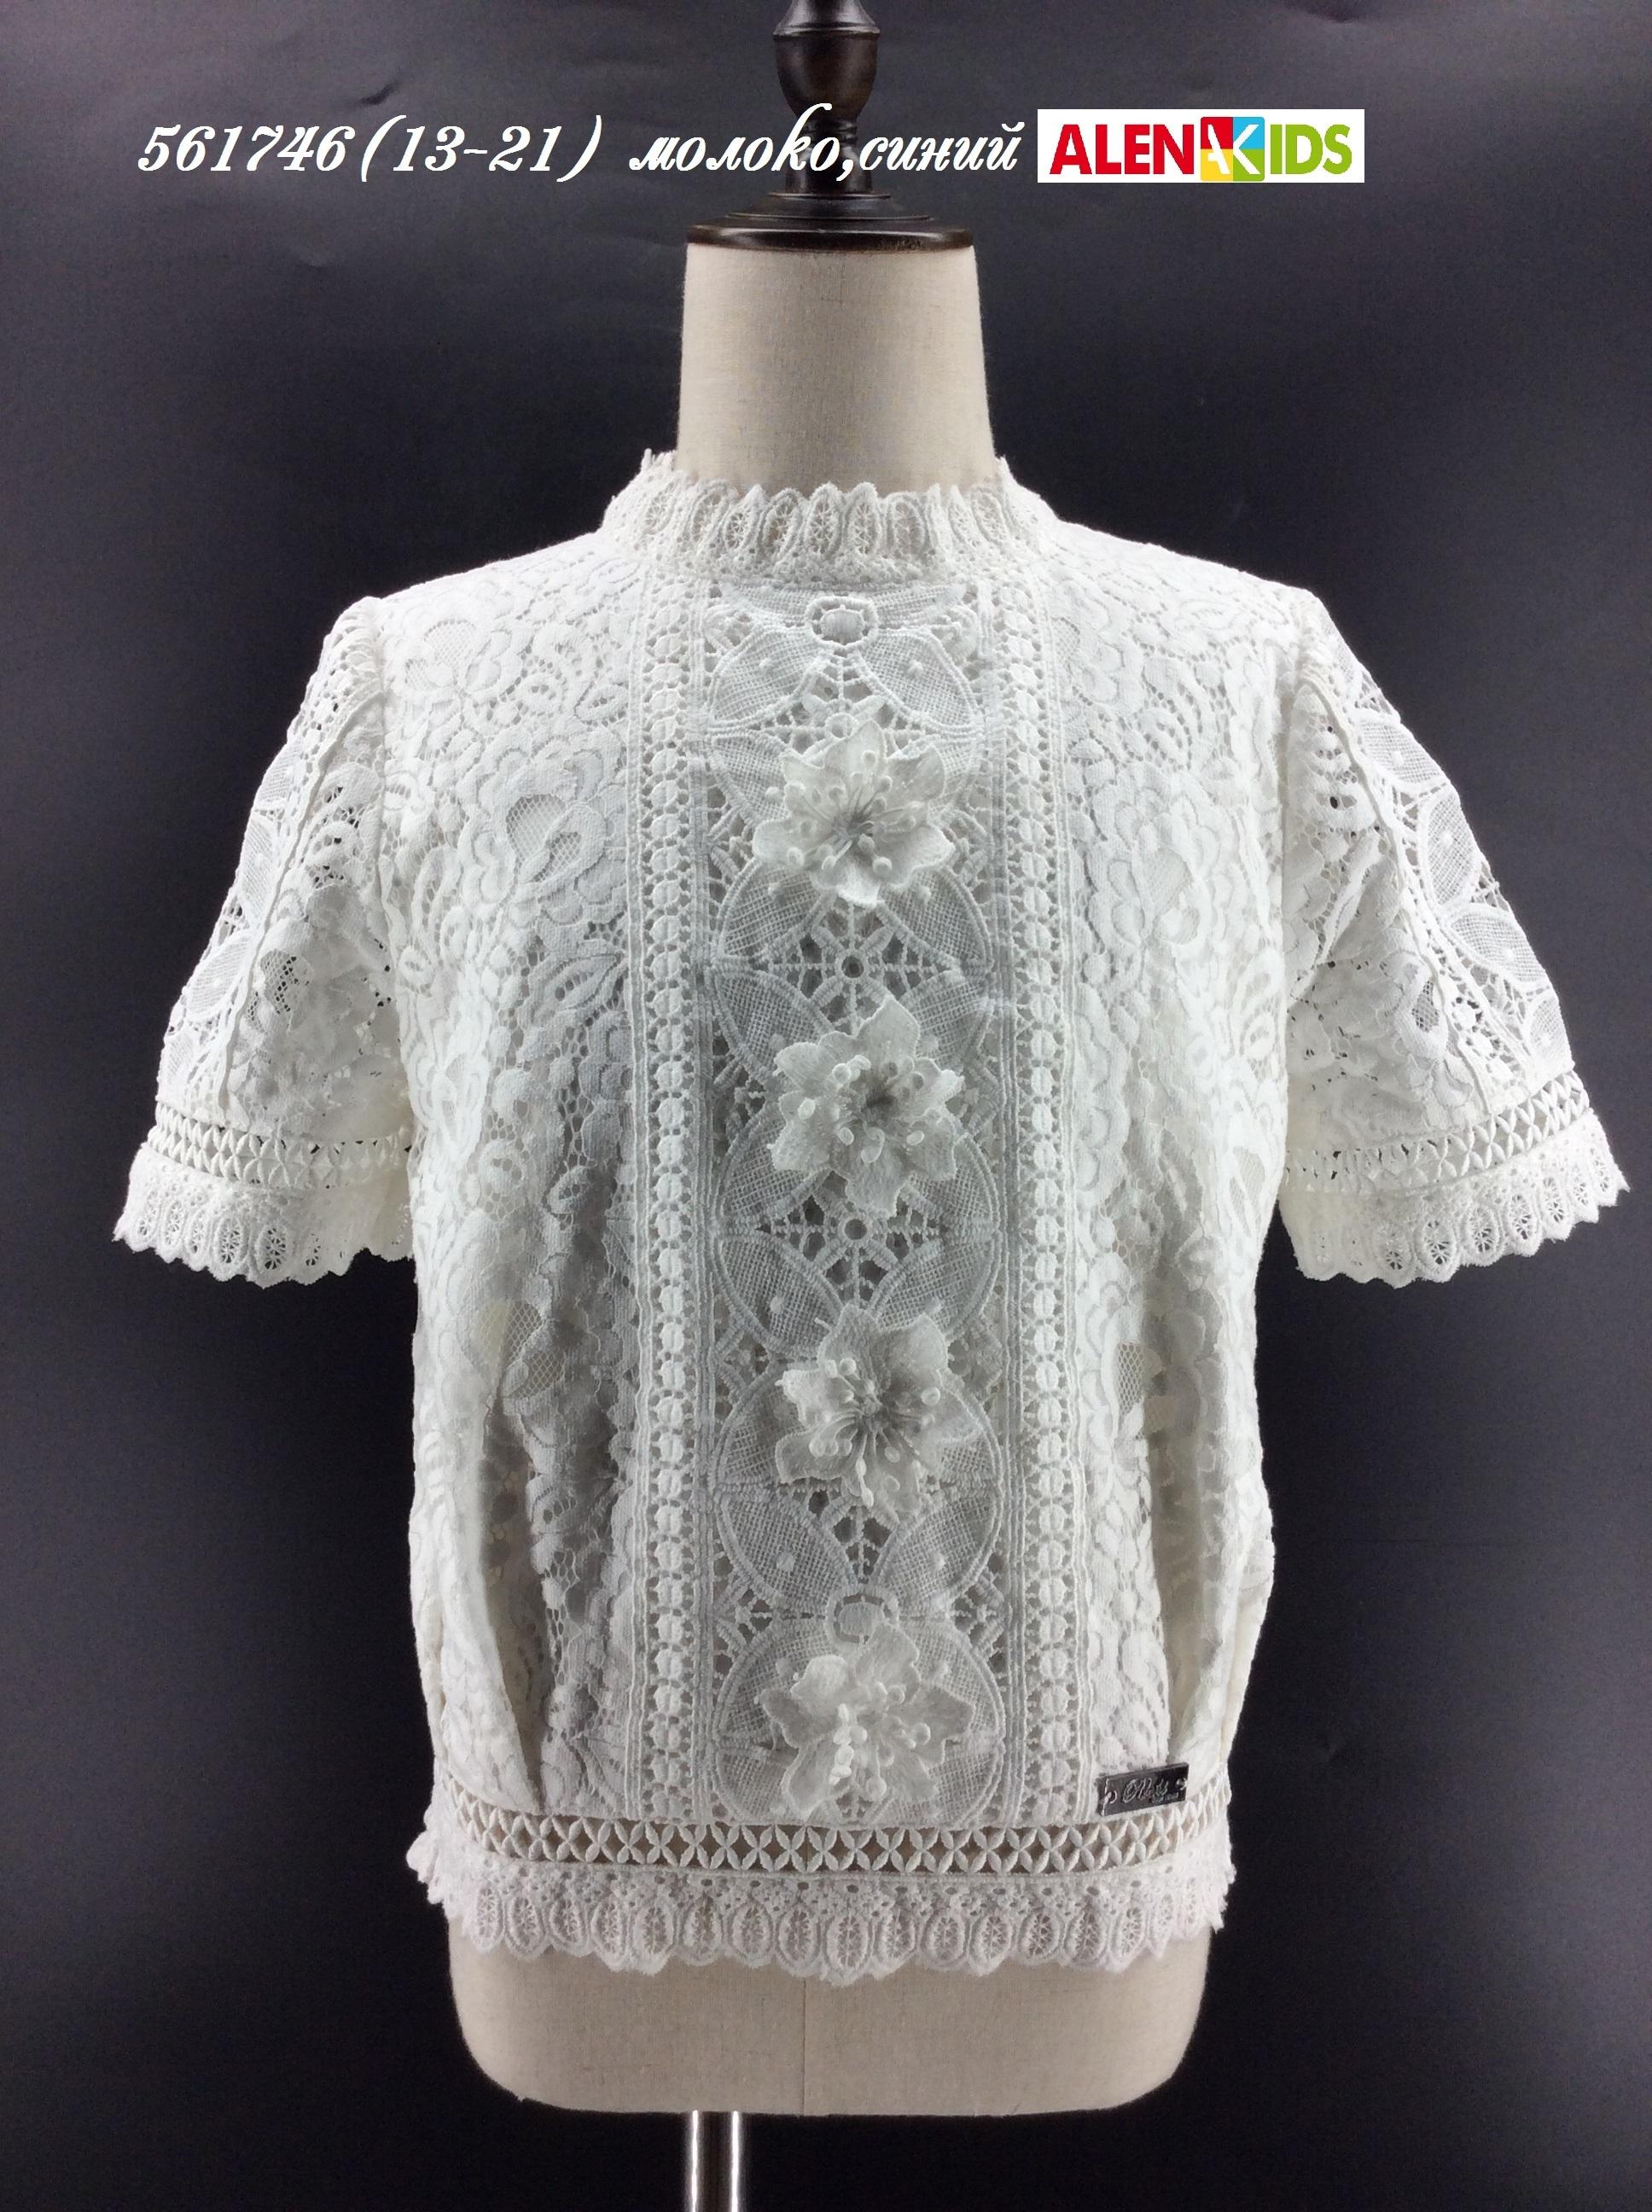 Блузка для девочки YGBH561746